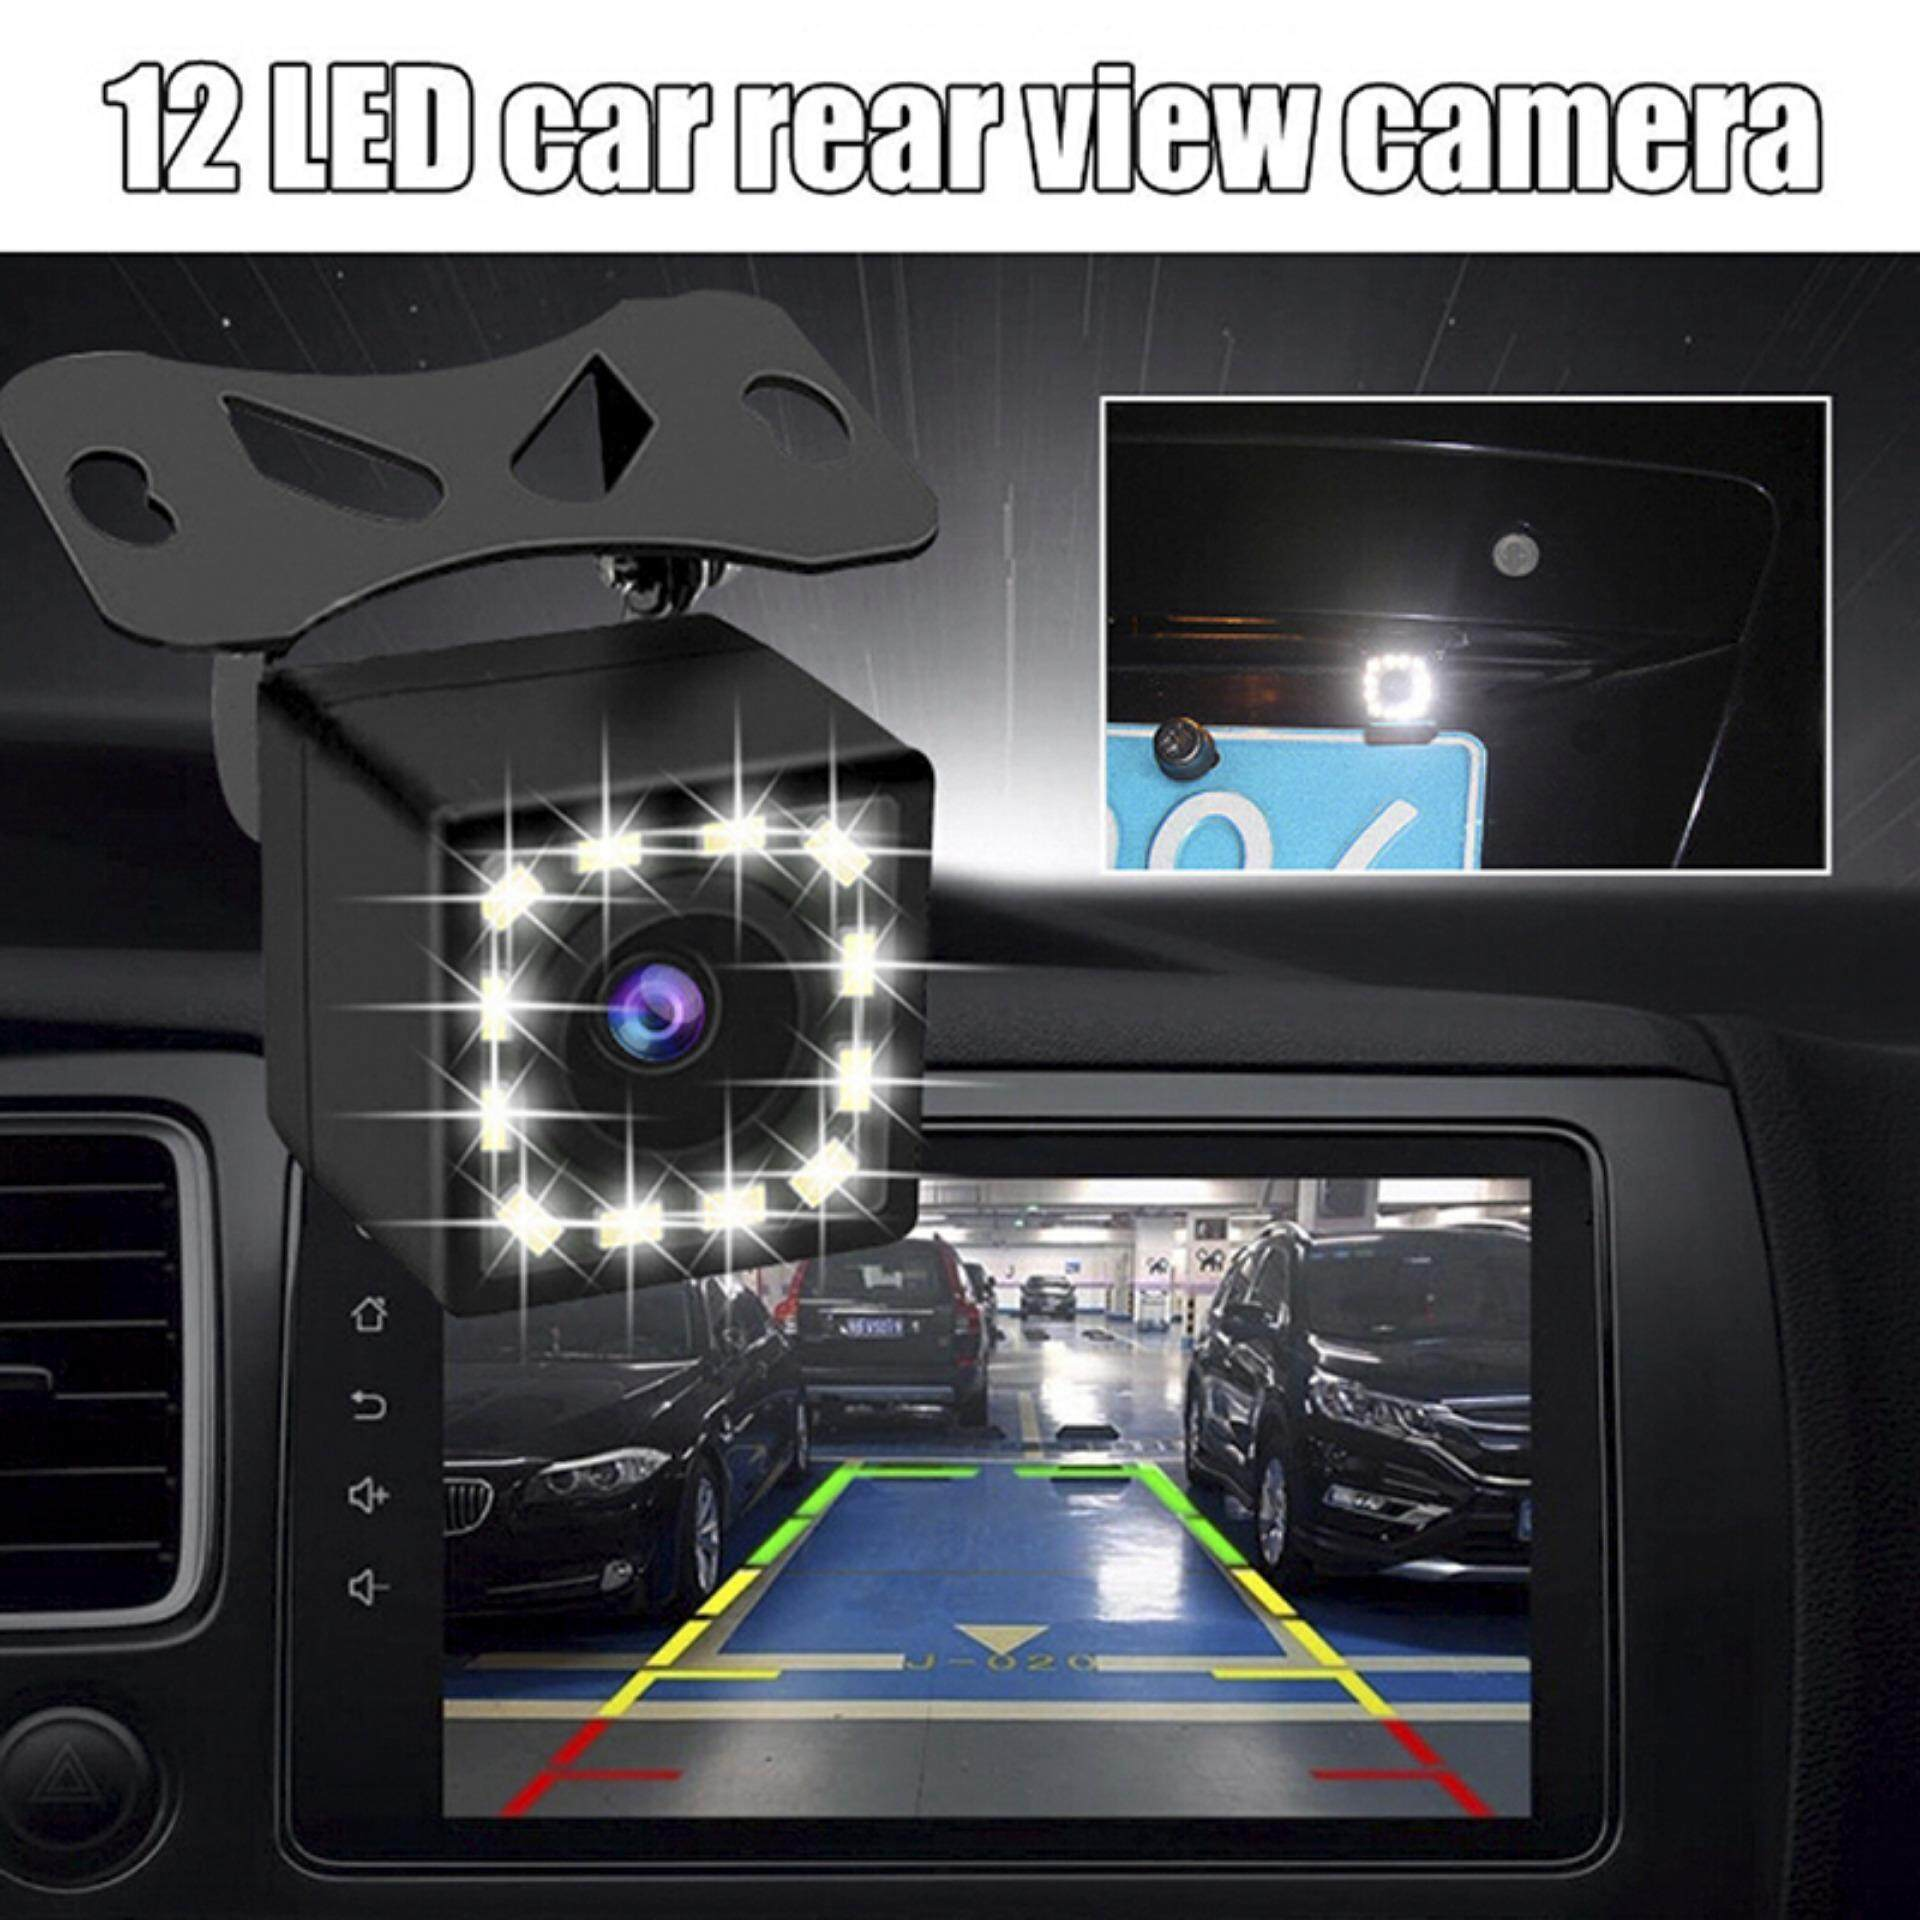 Mecola 12 LED HD ดูด้านหลังกล้อง Auto เซ็นเซอร์ติดท้ายรถยนต์กล้องการมองเห็นได้ในเวลากลางคืน